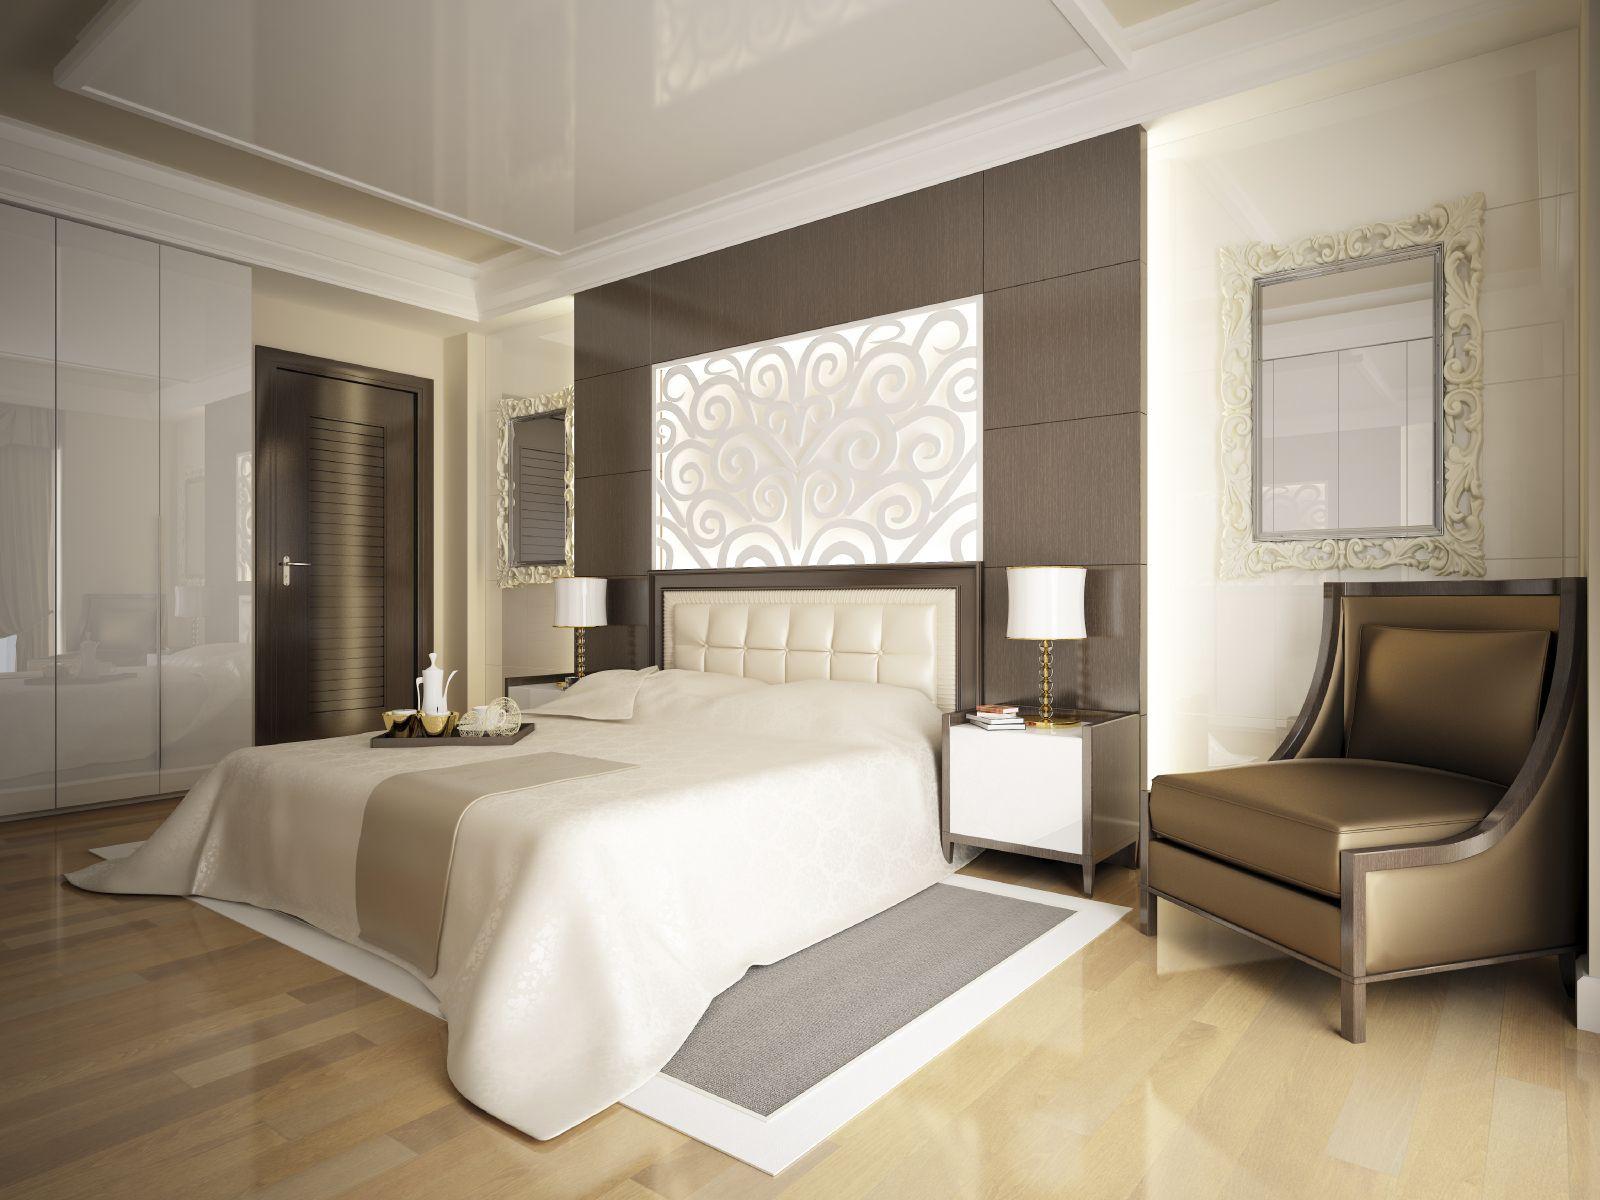 75 Primary Bedrooms with Hardwood Flooring (Photos